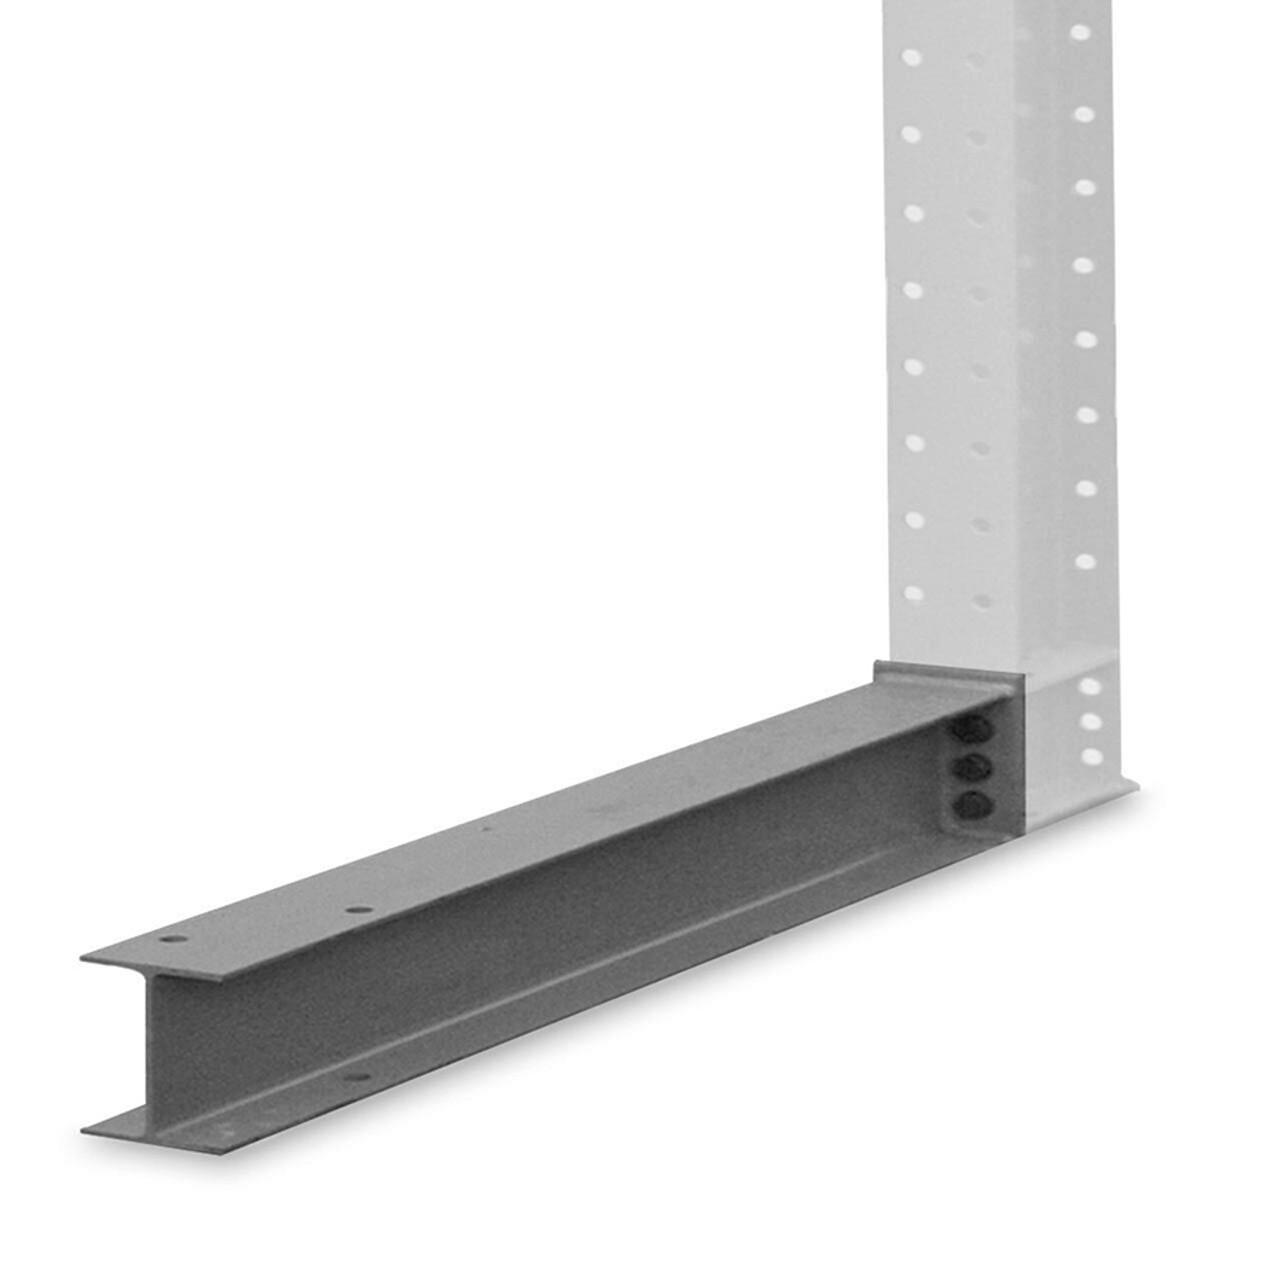 Cantilever rack base